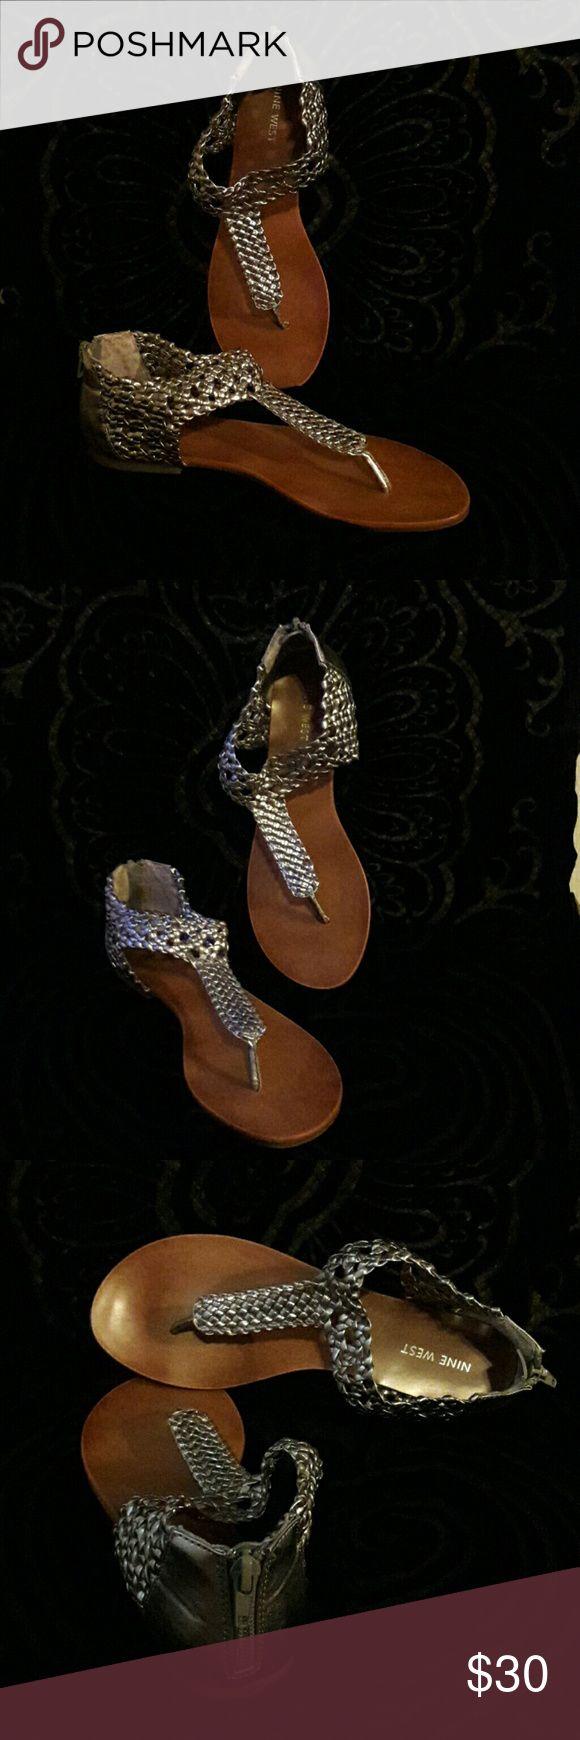 Nine West Pewter Sandals Pewter colored, Nine West summer sandals. Perfect with summer dresses. Nine West Shoes Sandals